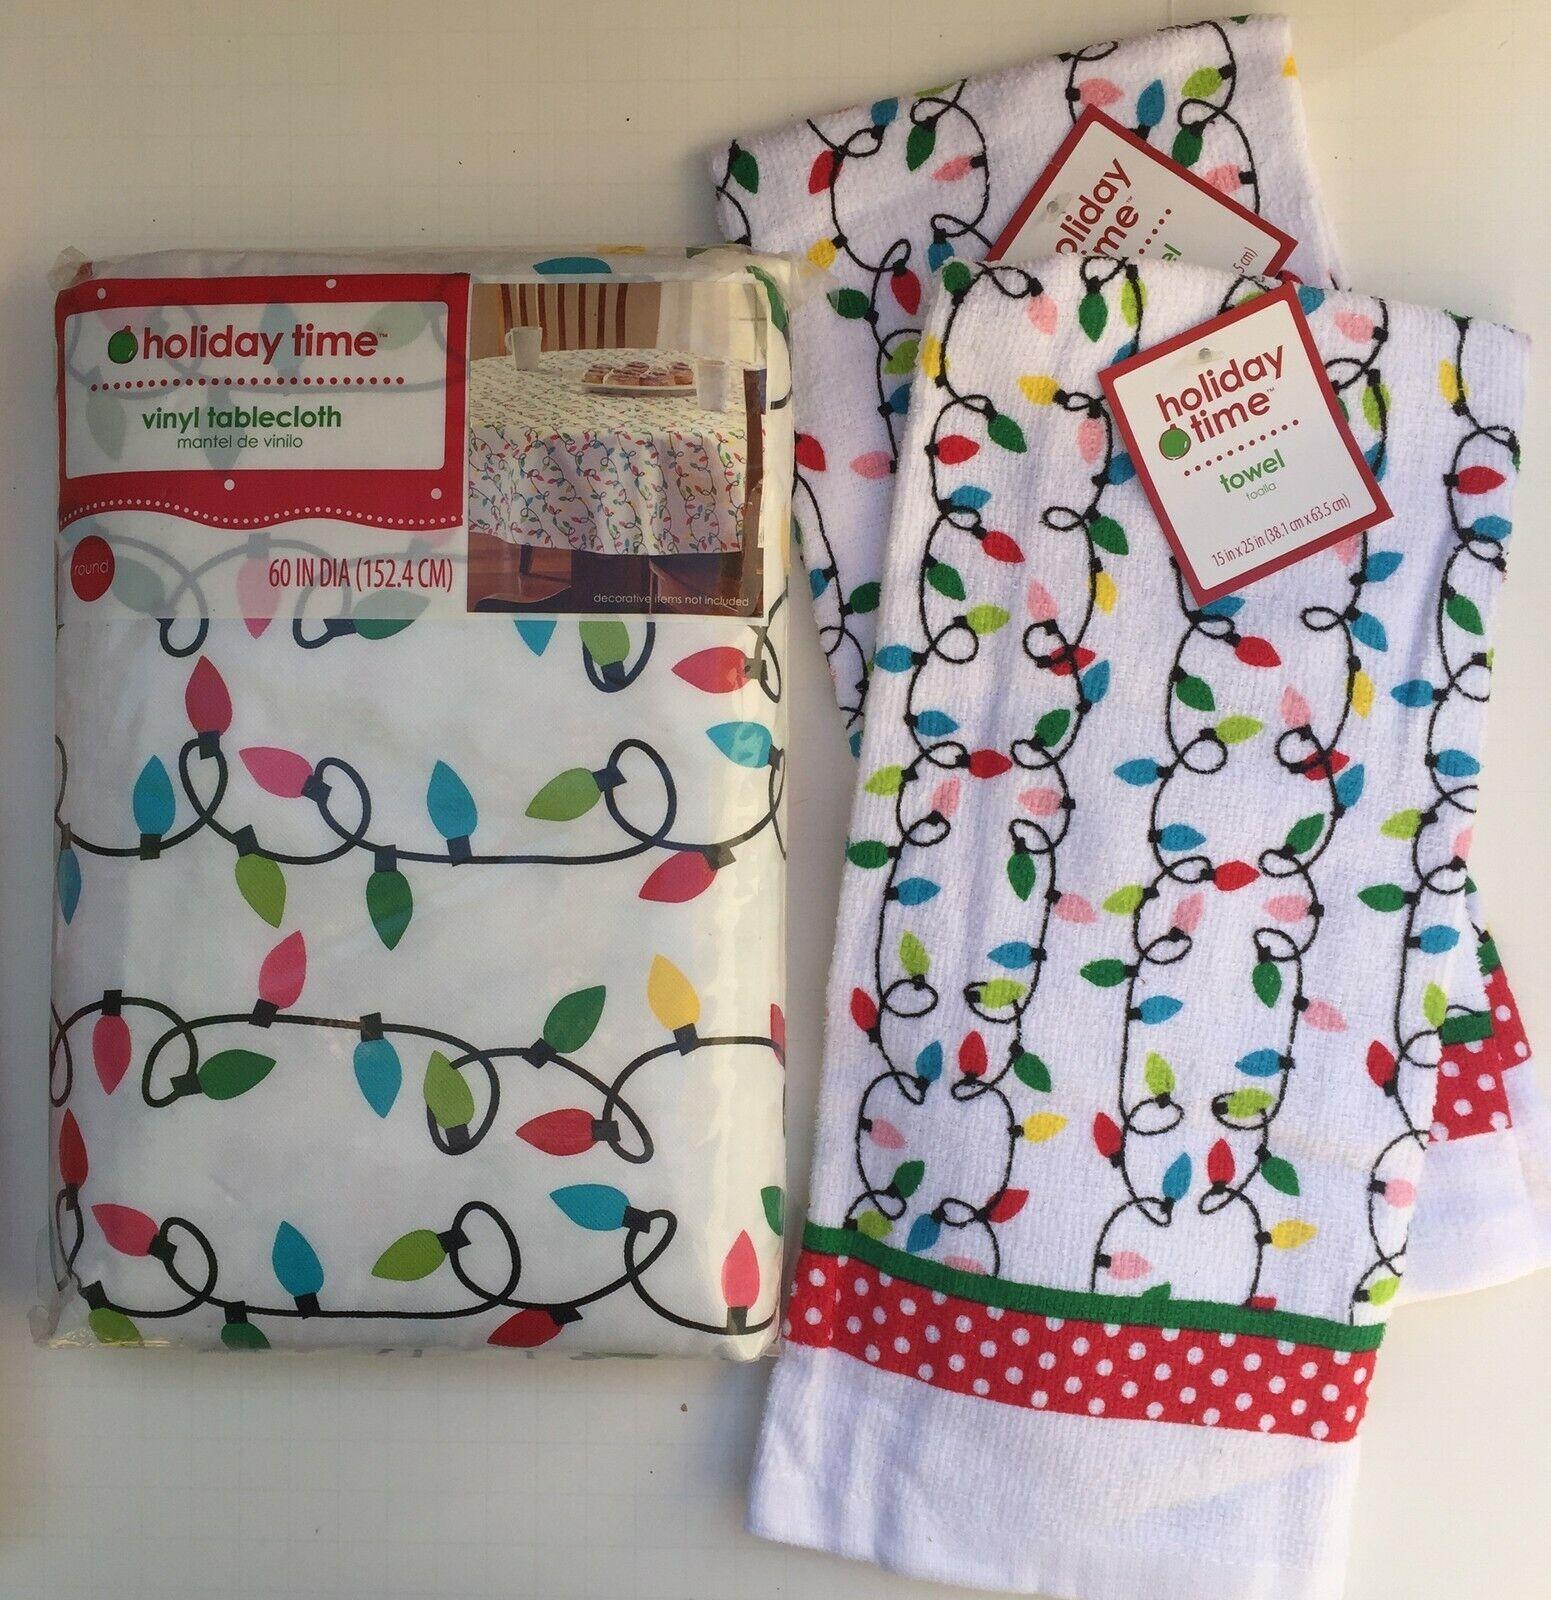 Vinyl Tablecloth 60 Round Christmas Tree Snowman Snowflakes For Sale Online Ebay